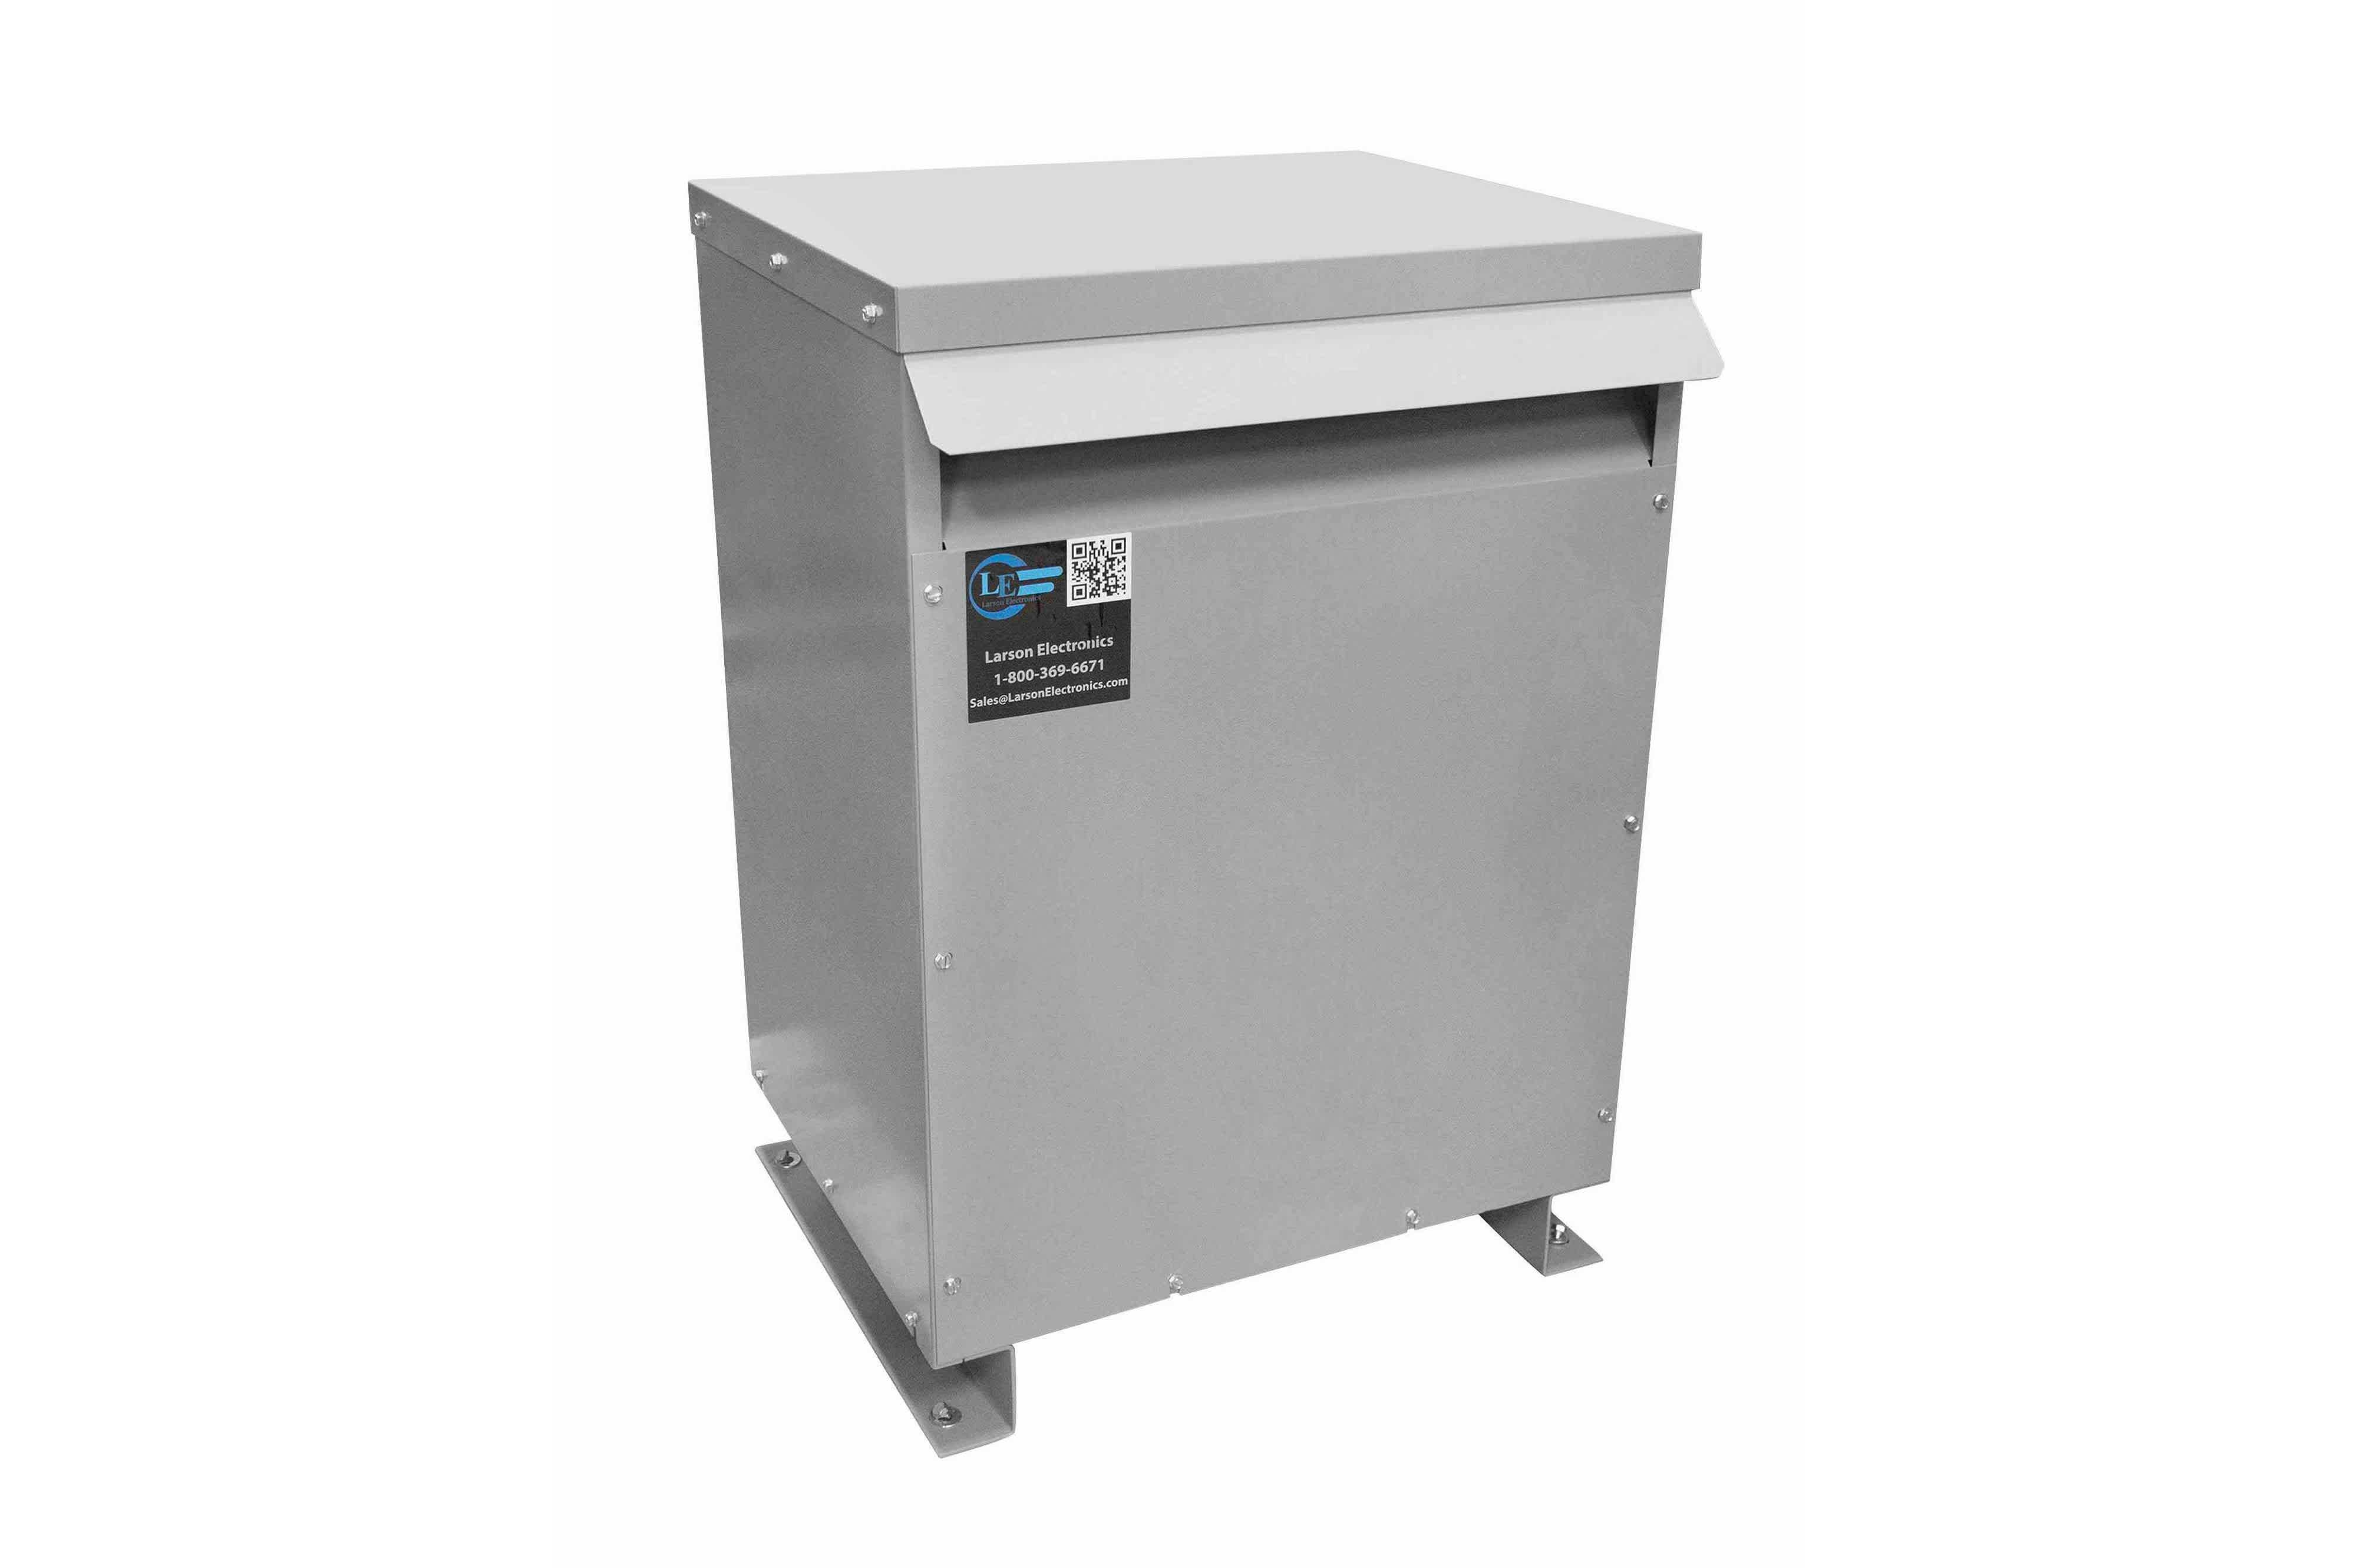 90 kVA 3PH Isolation Transformer, 480V Wye Primary, 600Y/347 Wye-N Secondary, N3R, Ventilated, 60 Hz